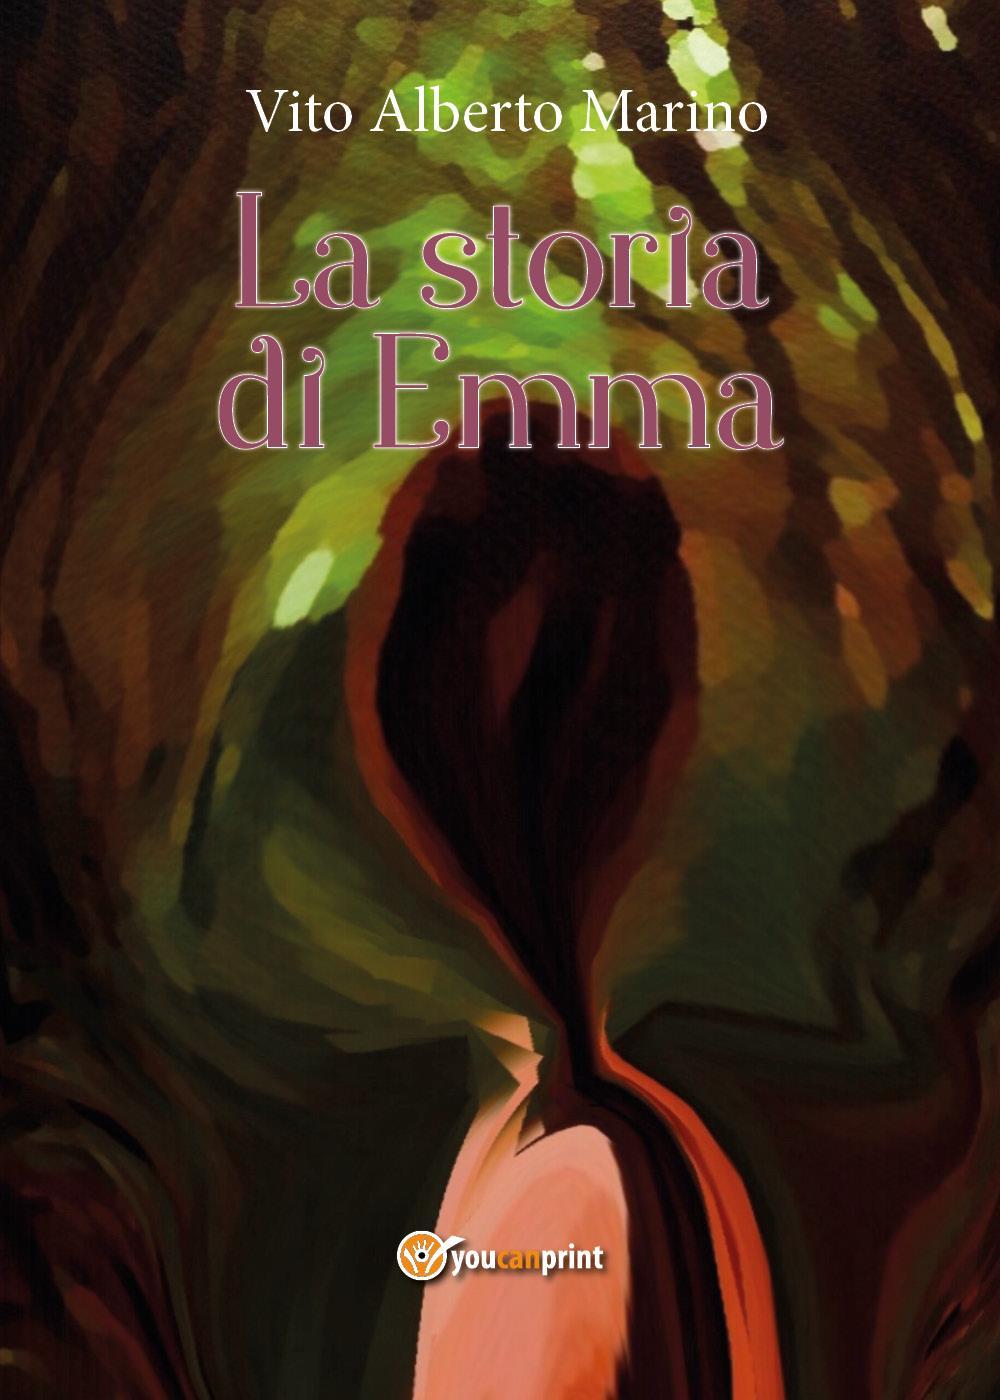 La storia di Emma